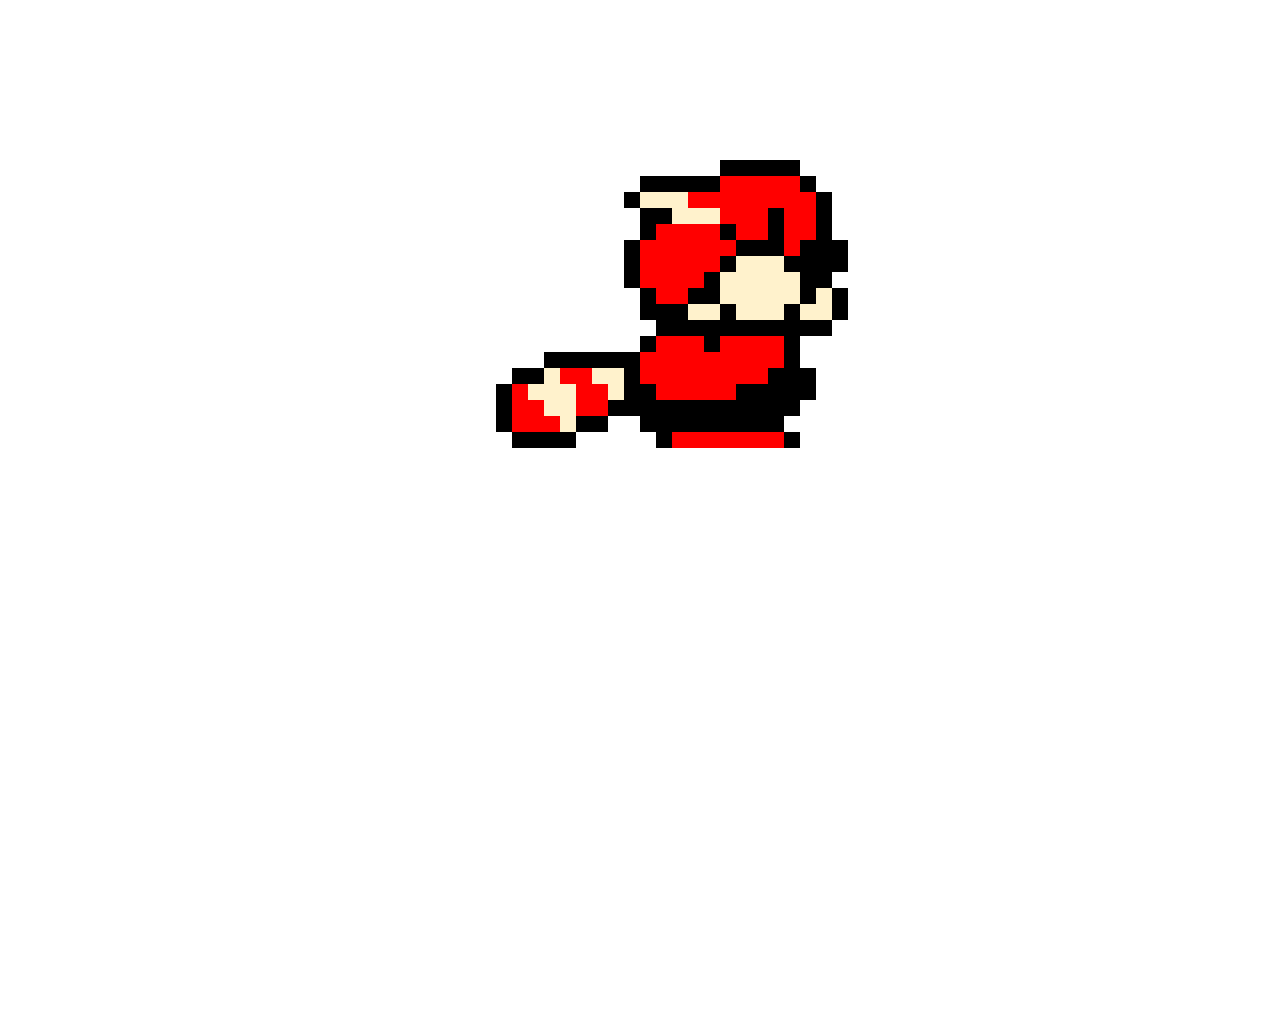 SMB3 Racoon Mario Crouching Sprite